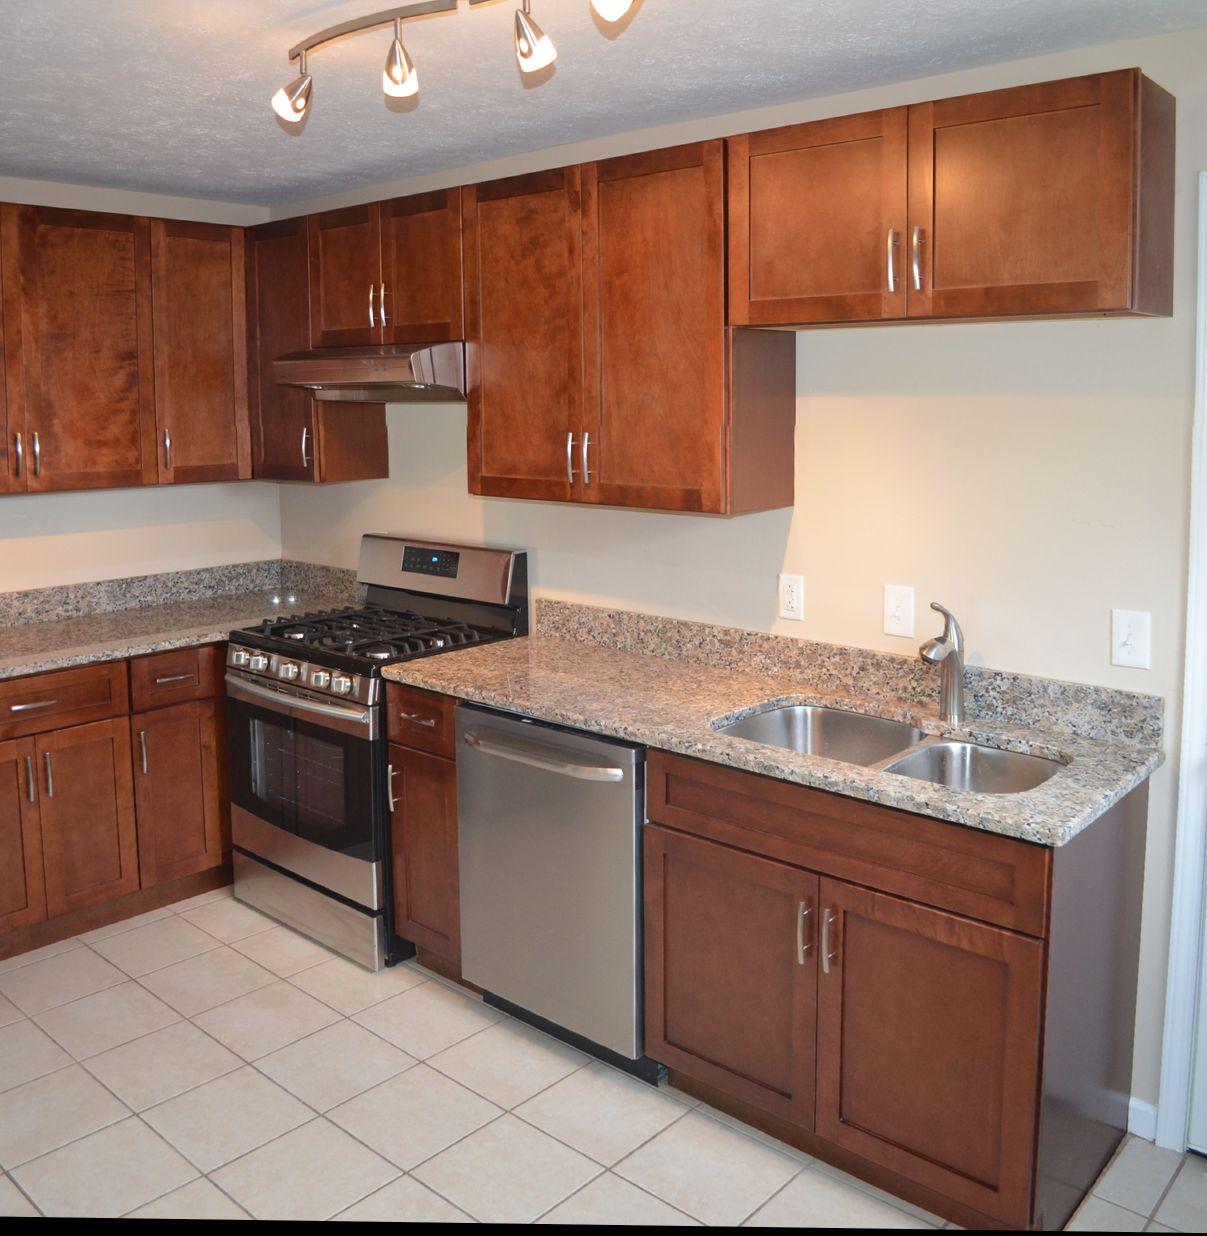 Crestwood Kitchen Cabinets: New Kitchen 3 Bedrooms Crestwood Schools